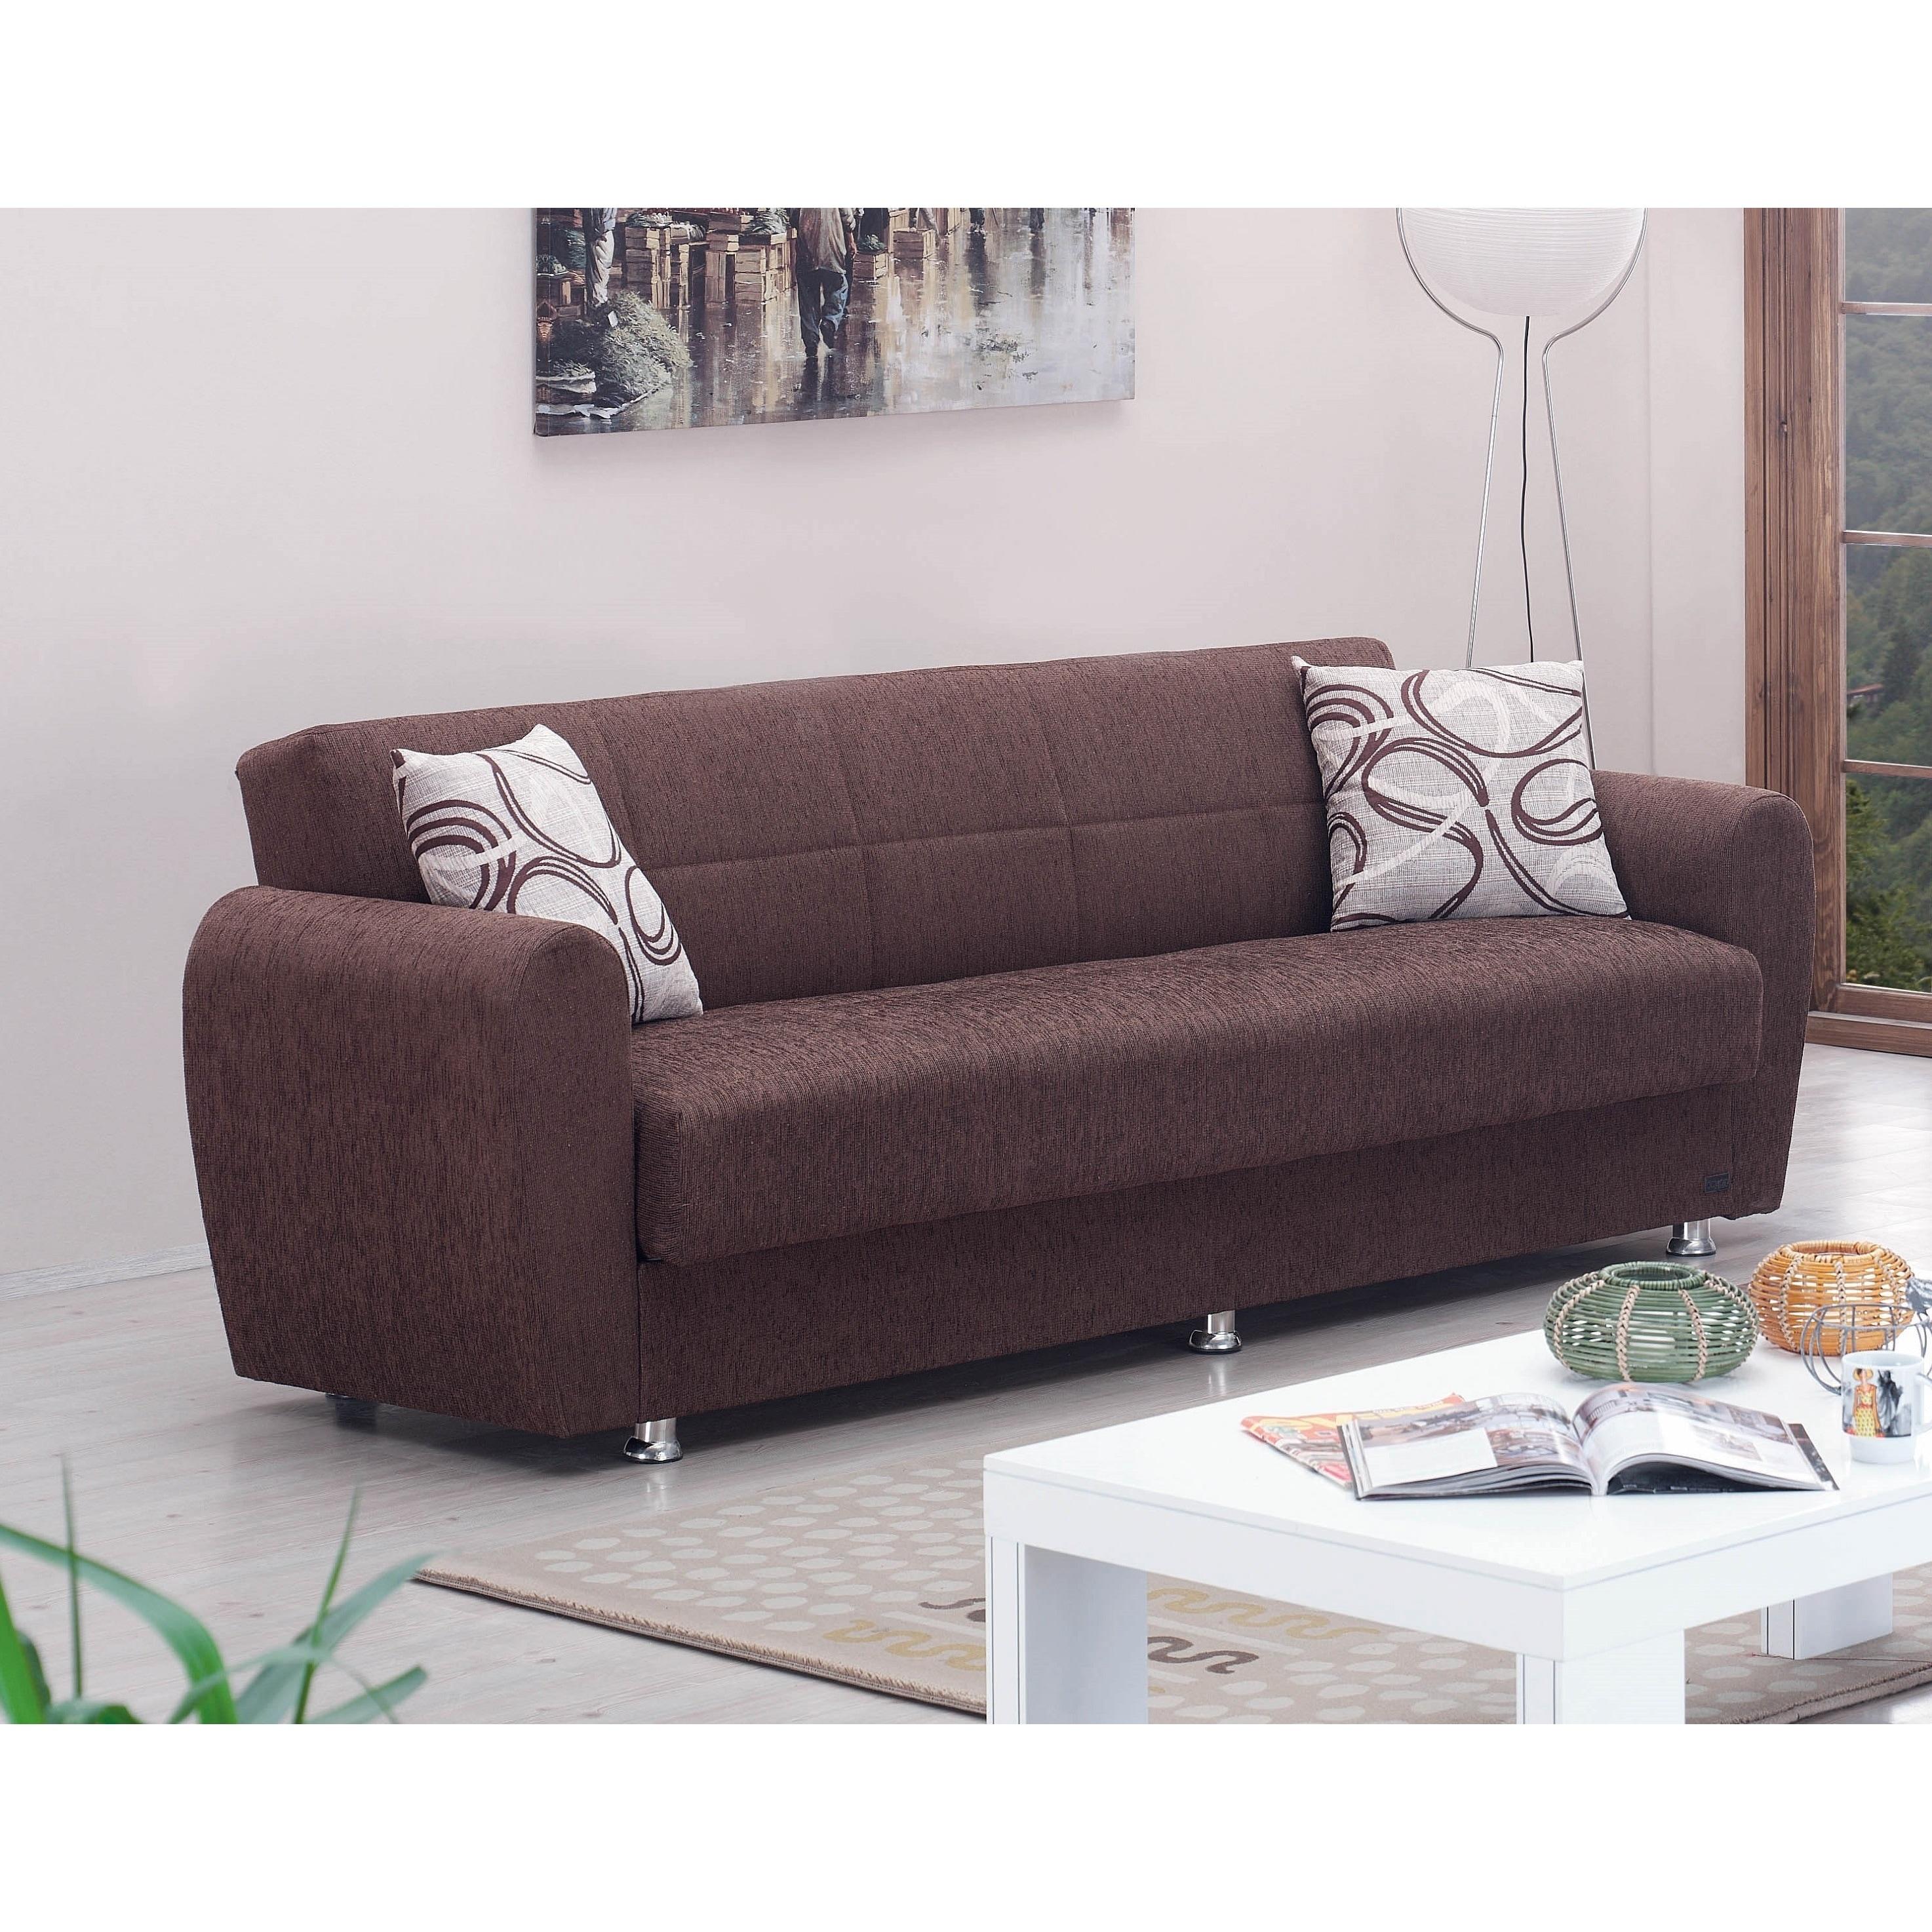 Boston Convertible Sofa Bed